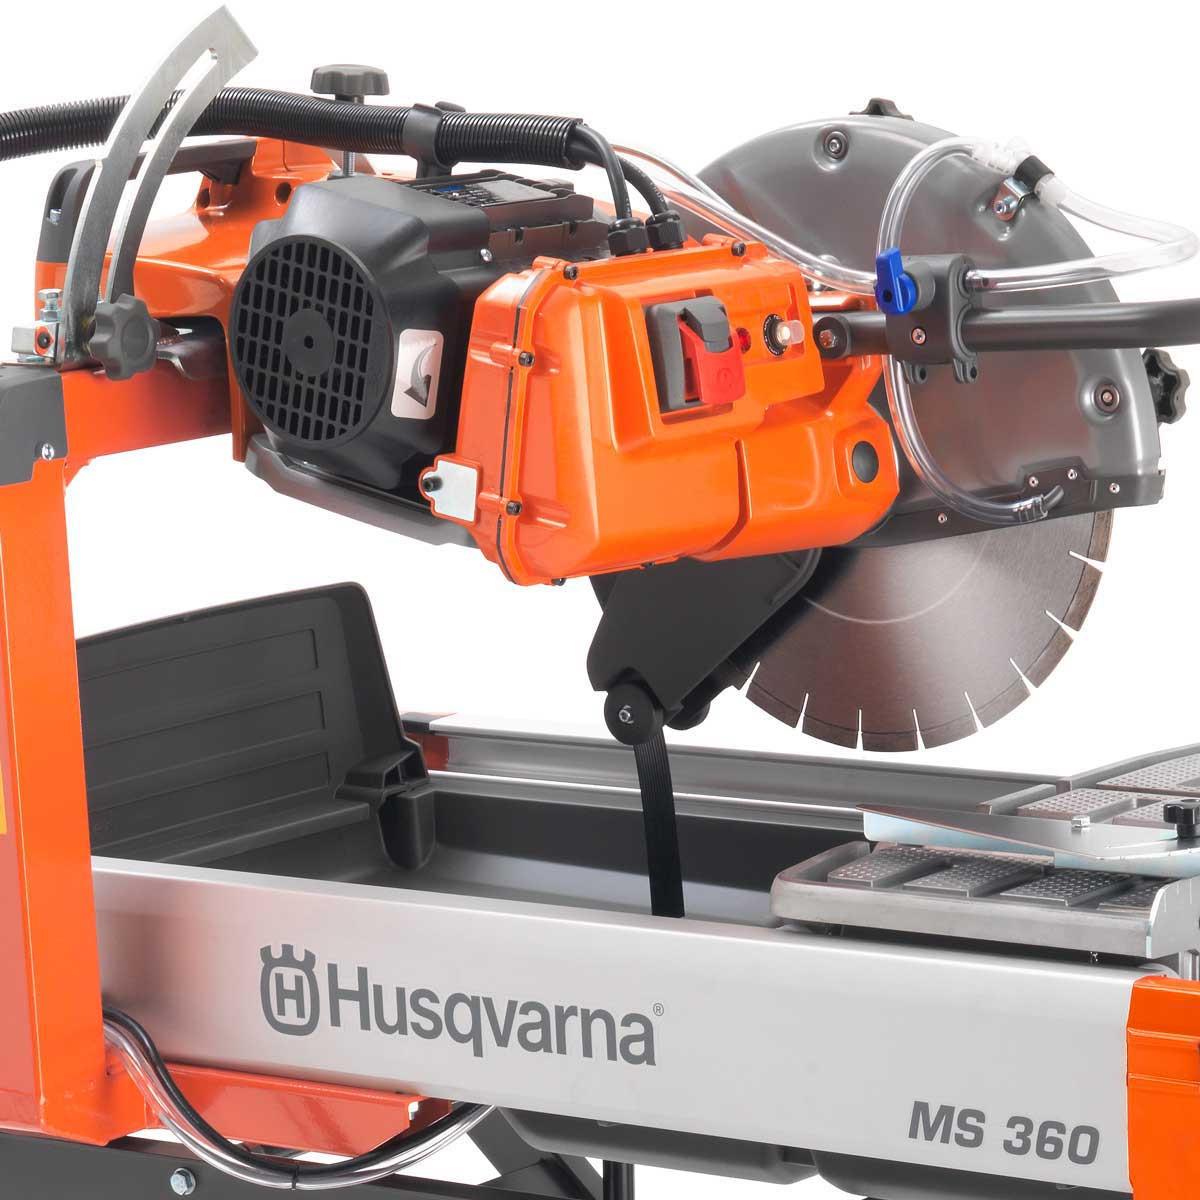 husqvarna ms 360 14in masonry saw motor and dual water feed